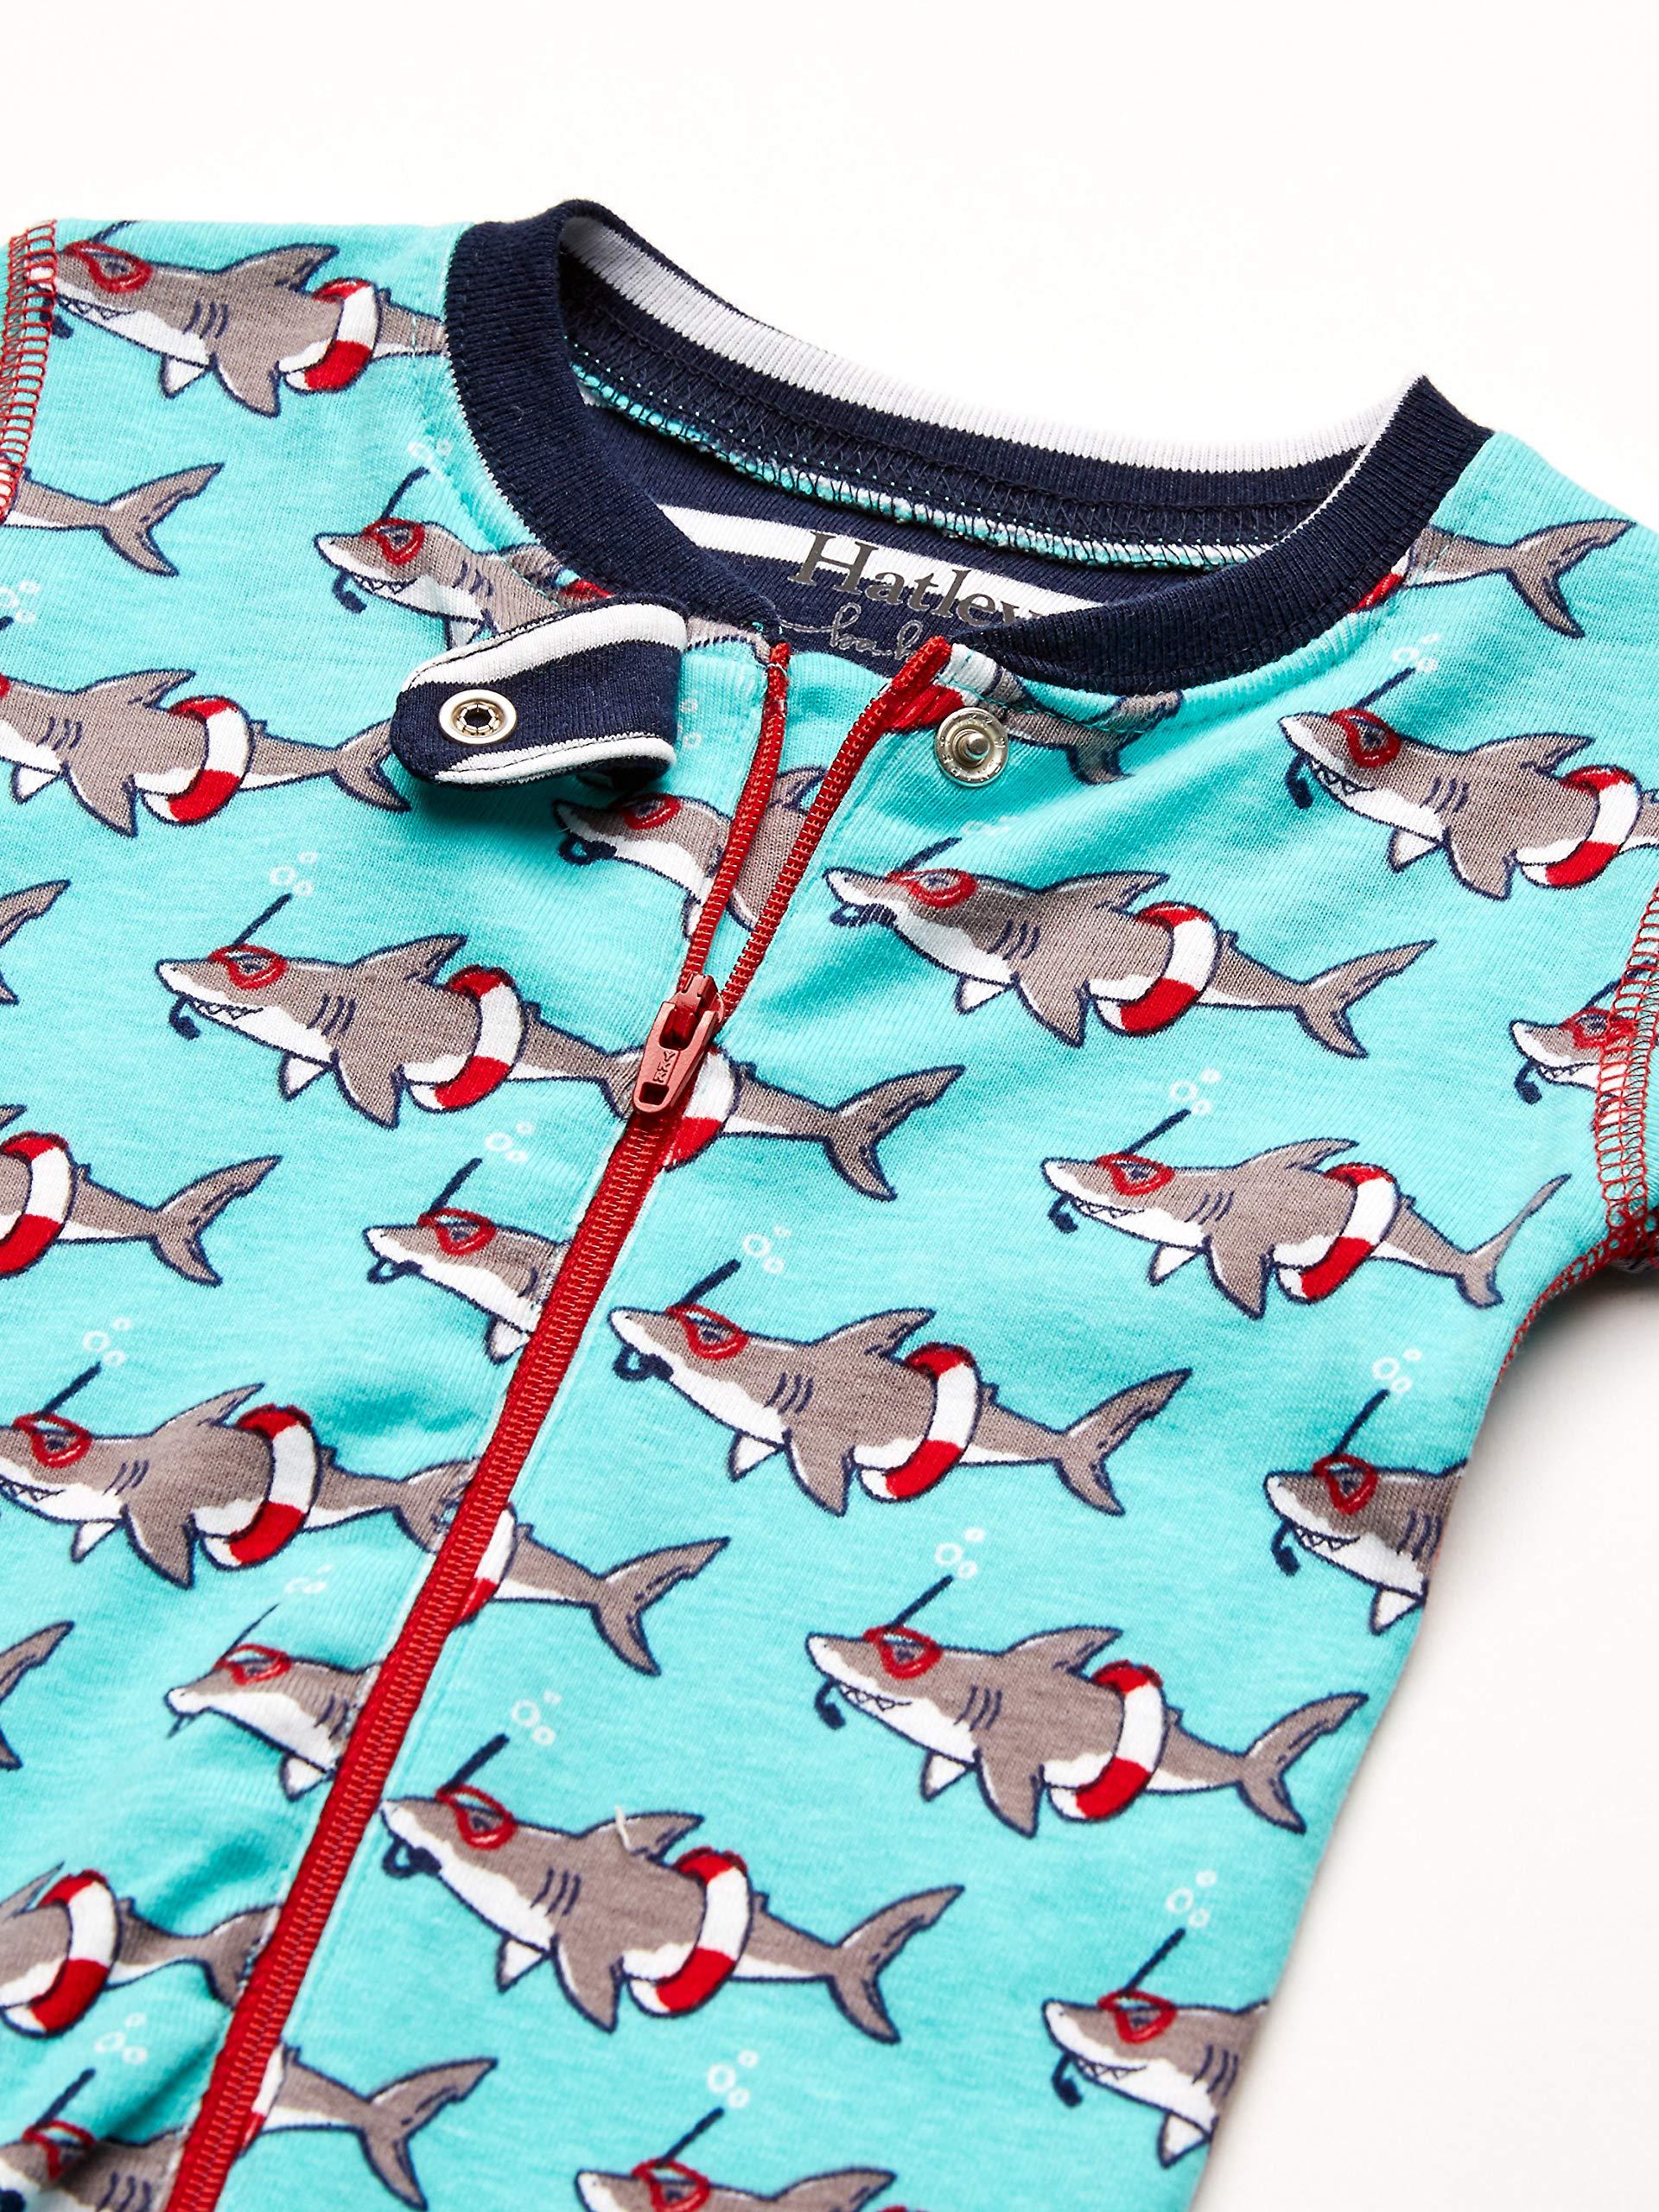 Hatley Organic Cotton Sleepsuit Pelele para Dormir para Bebés 4